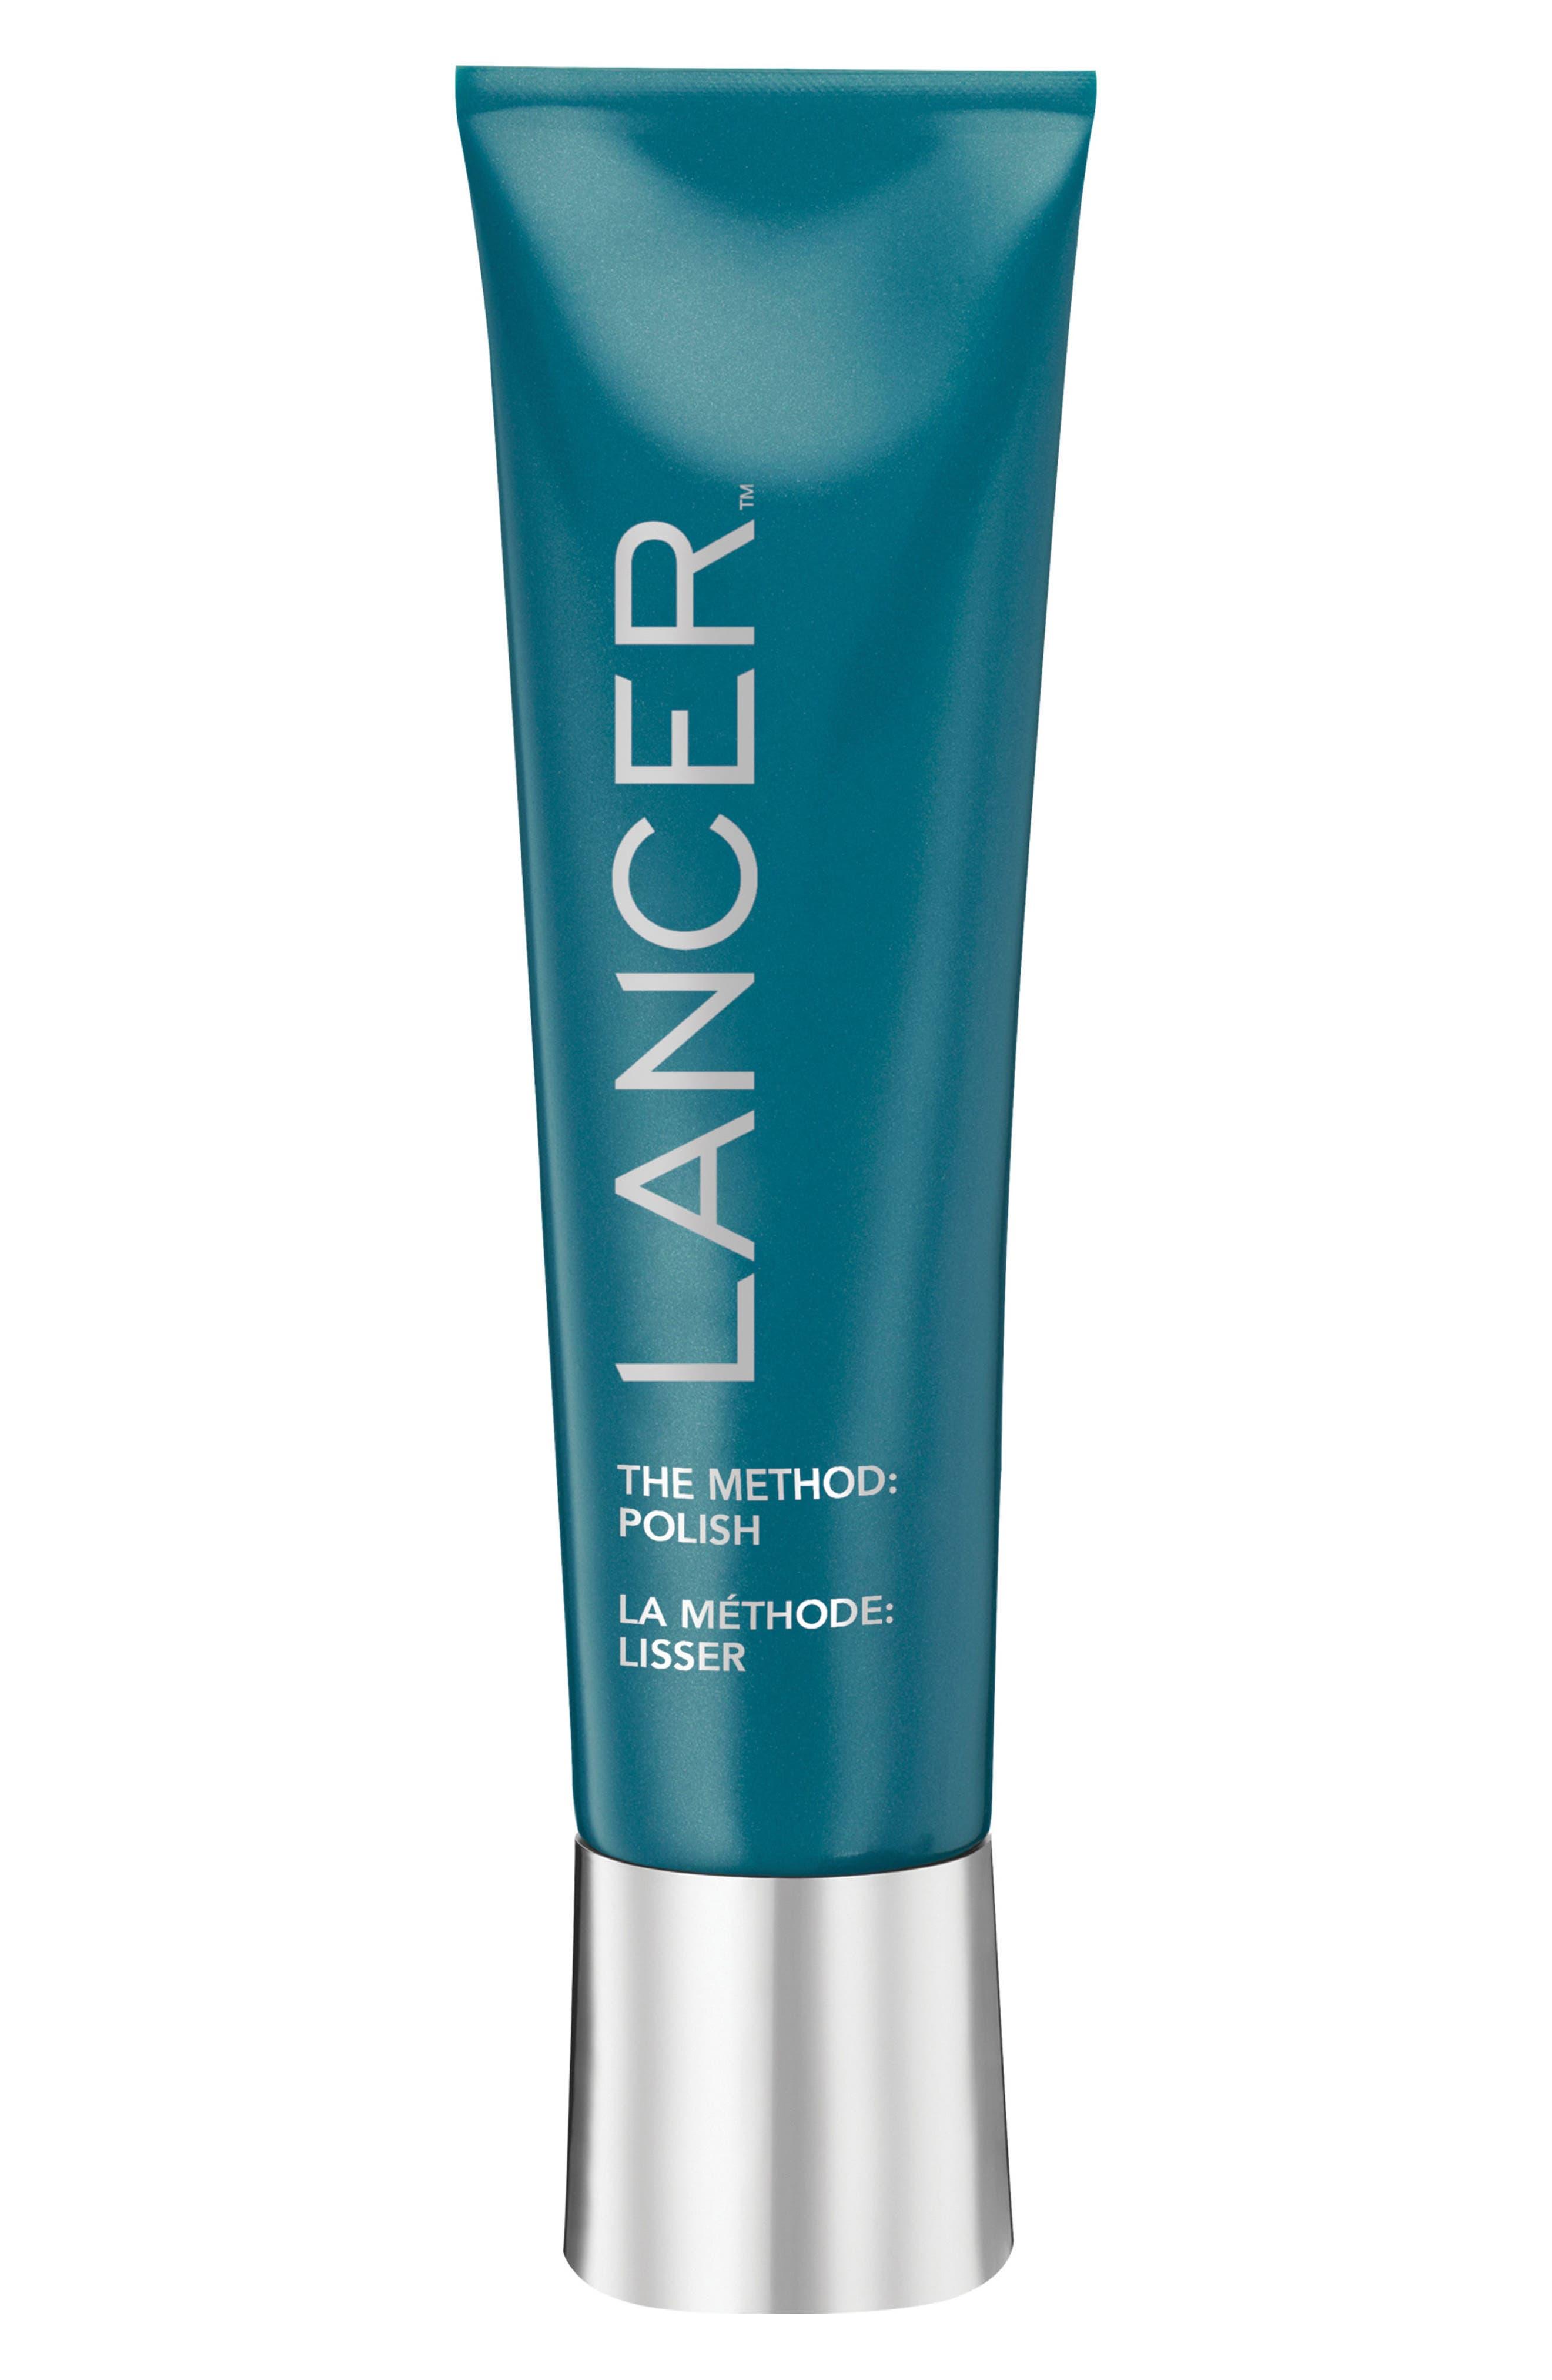 The Method Polish Exfoliator by Lancer Skincare